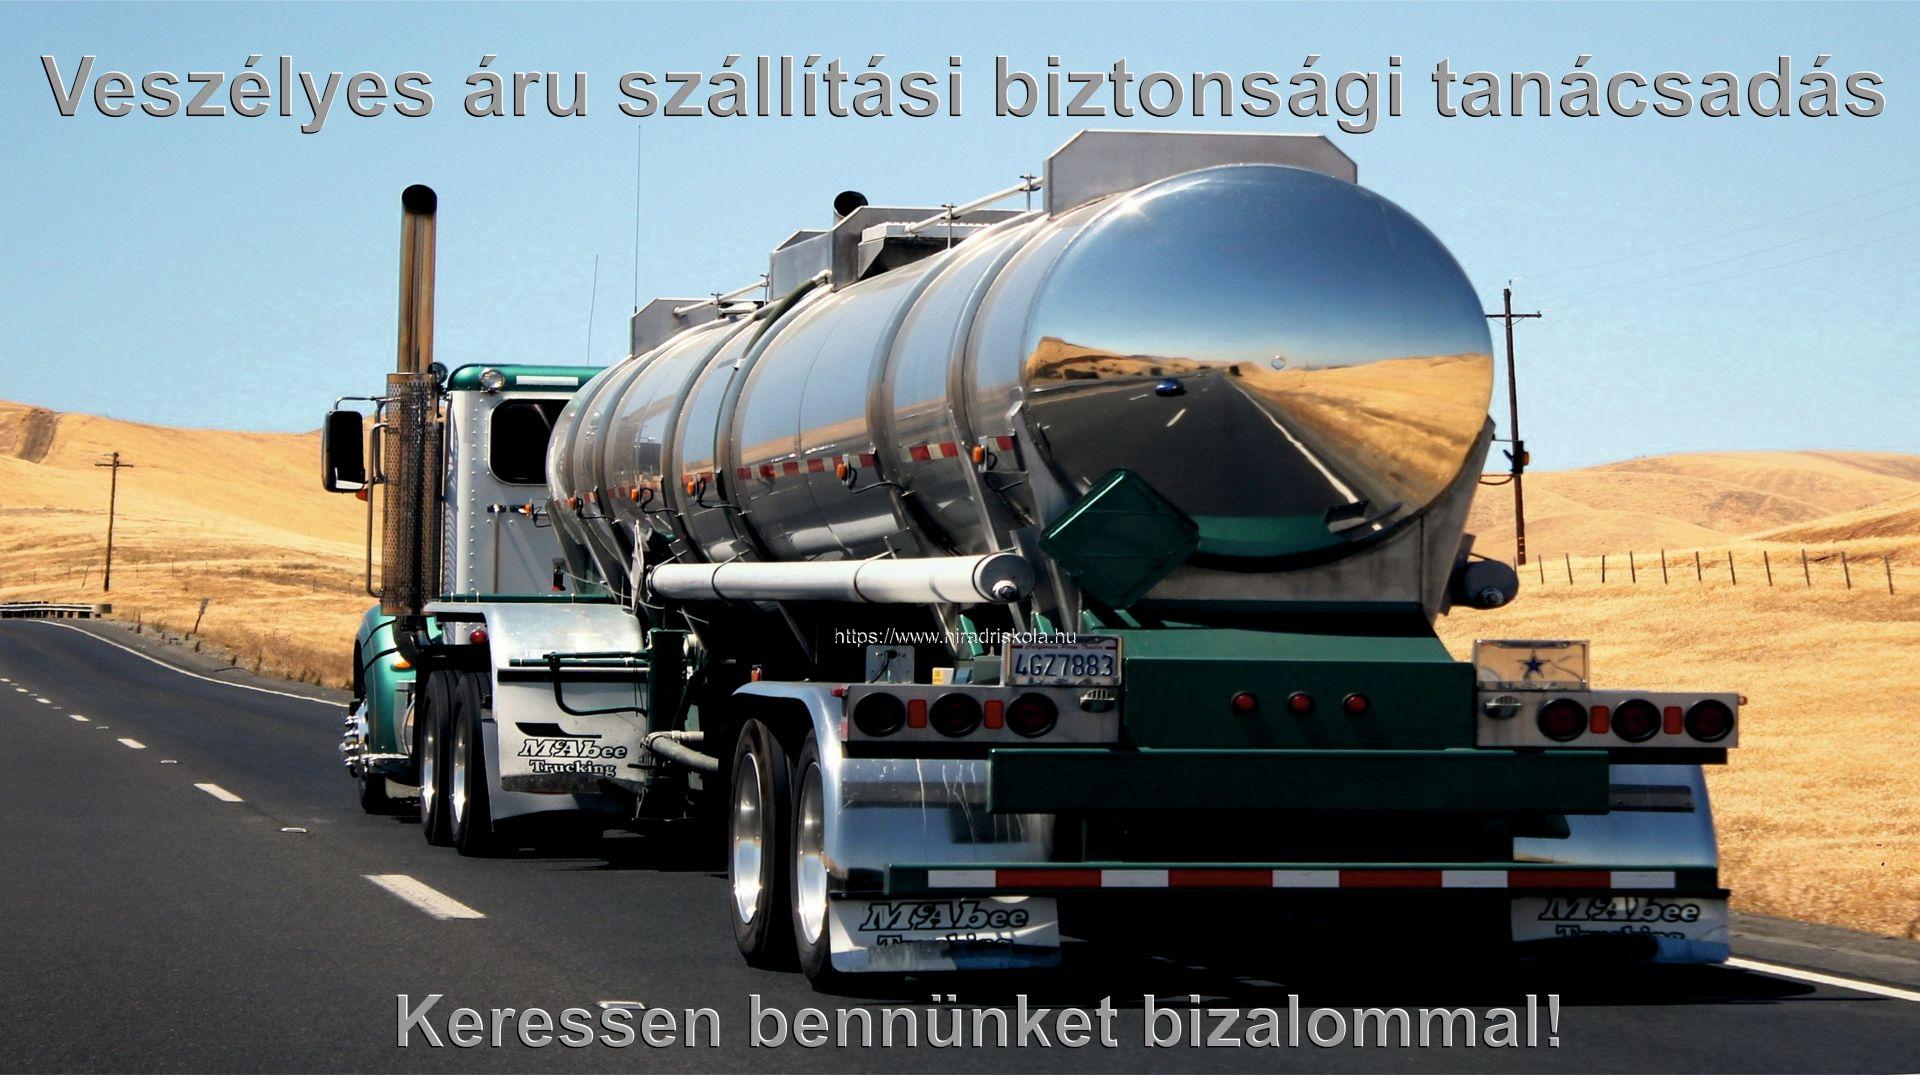 bev-kep-7BCE79664-B55A-C4E4-E643-C8DEAF9B70B6.jpg